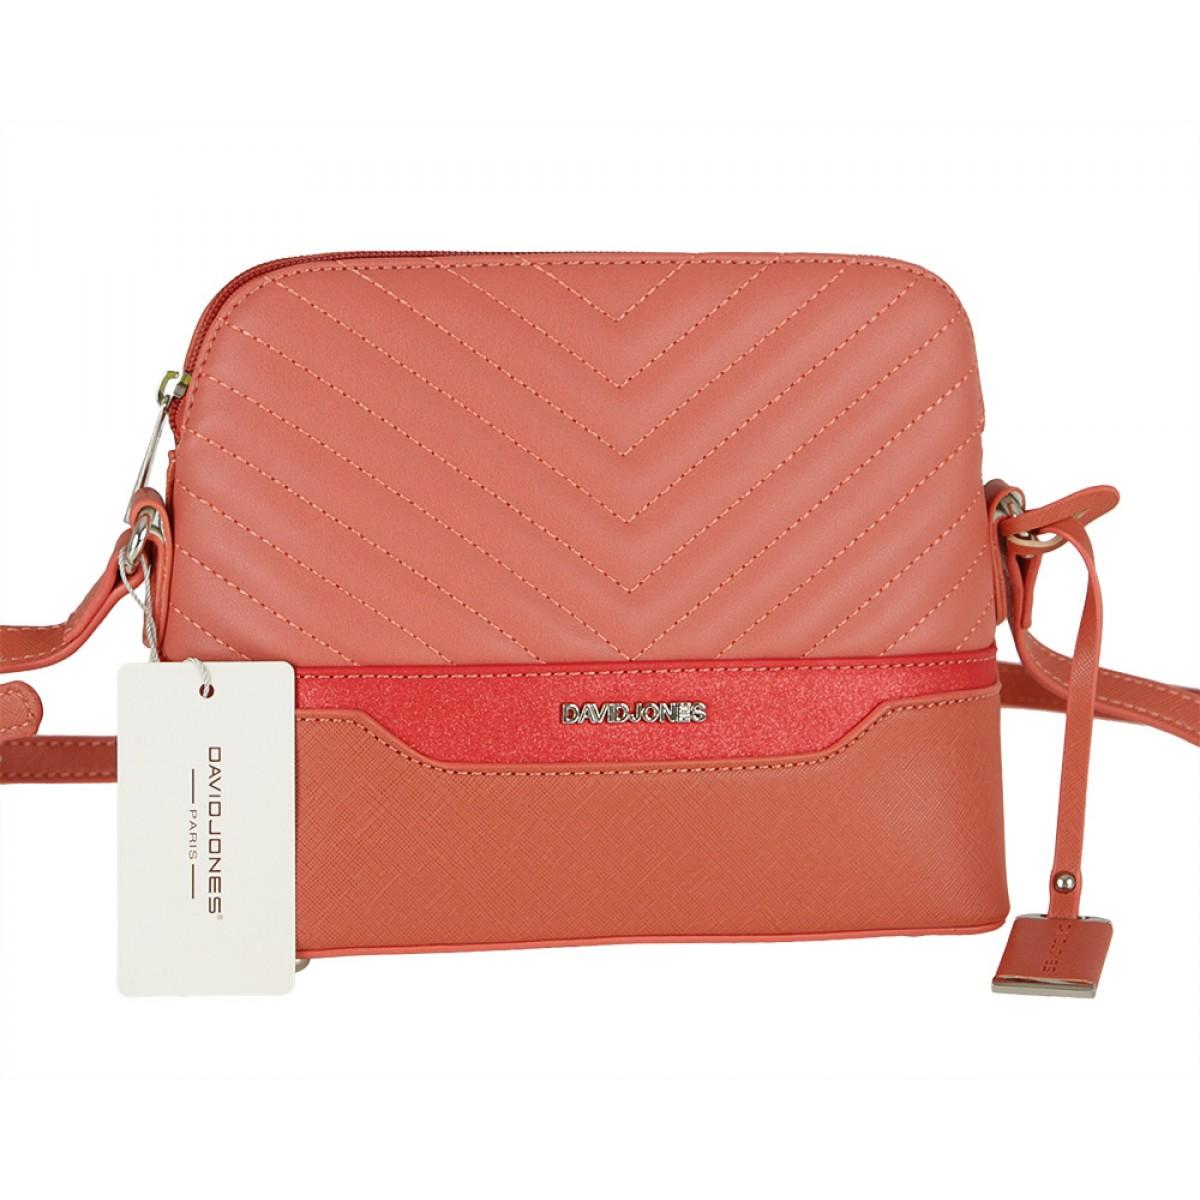 Жіноча сумка David Jones 6220-1 BRICK RED